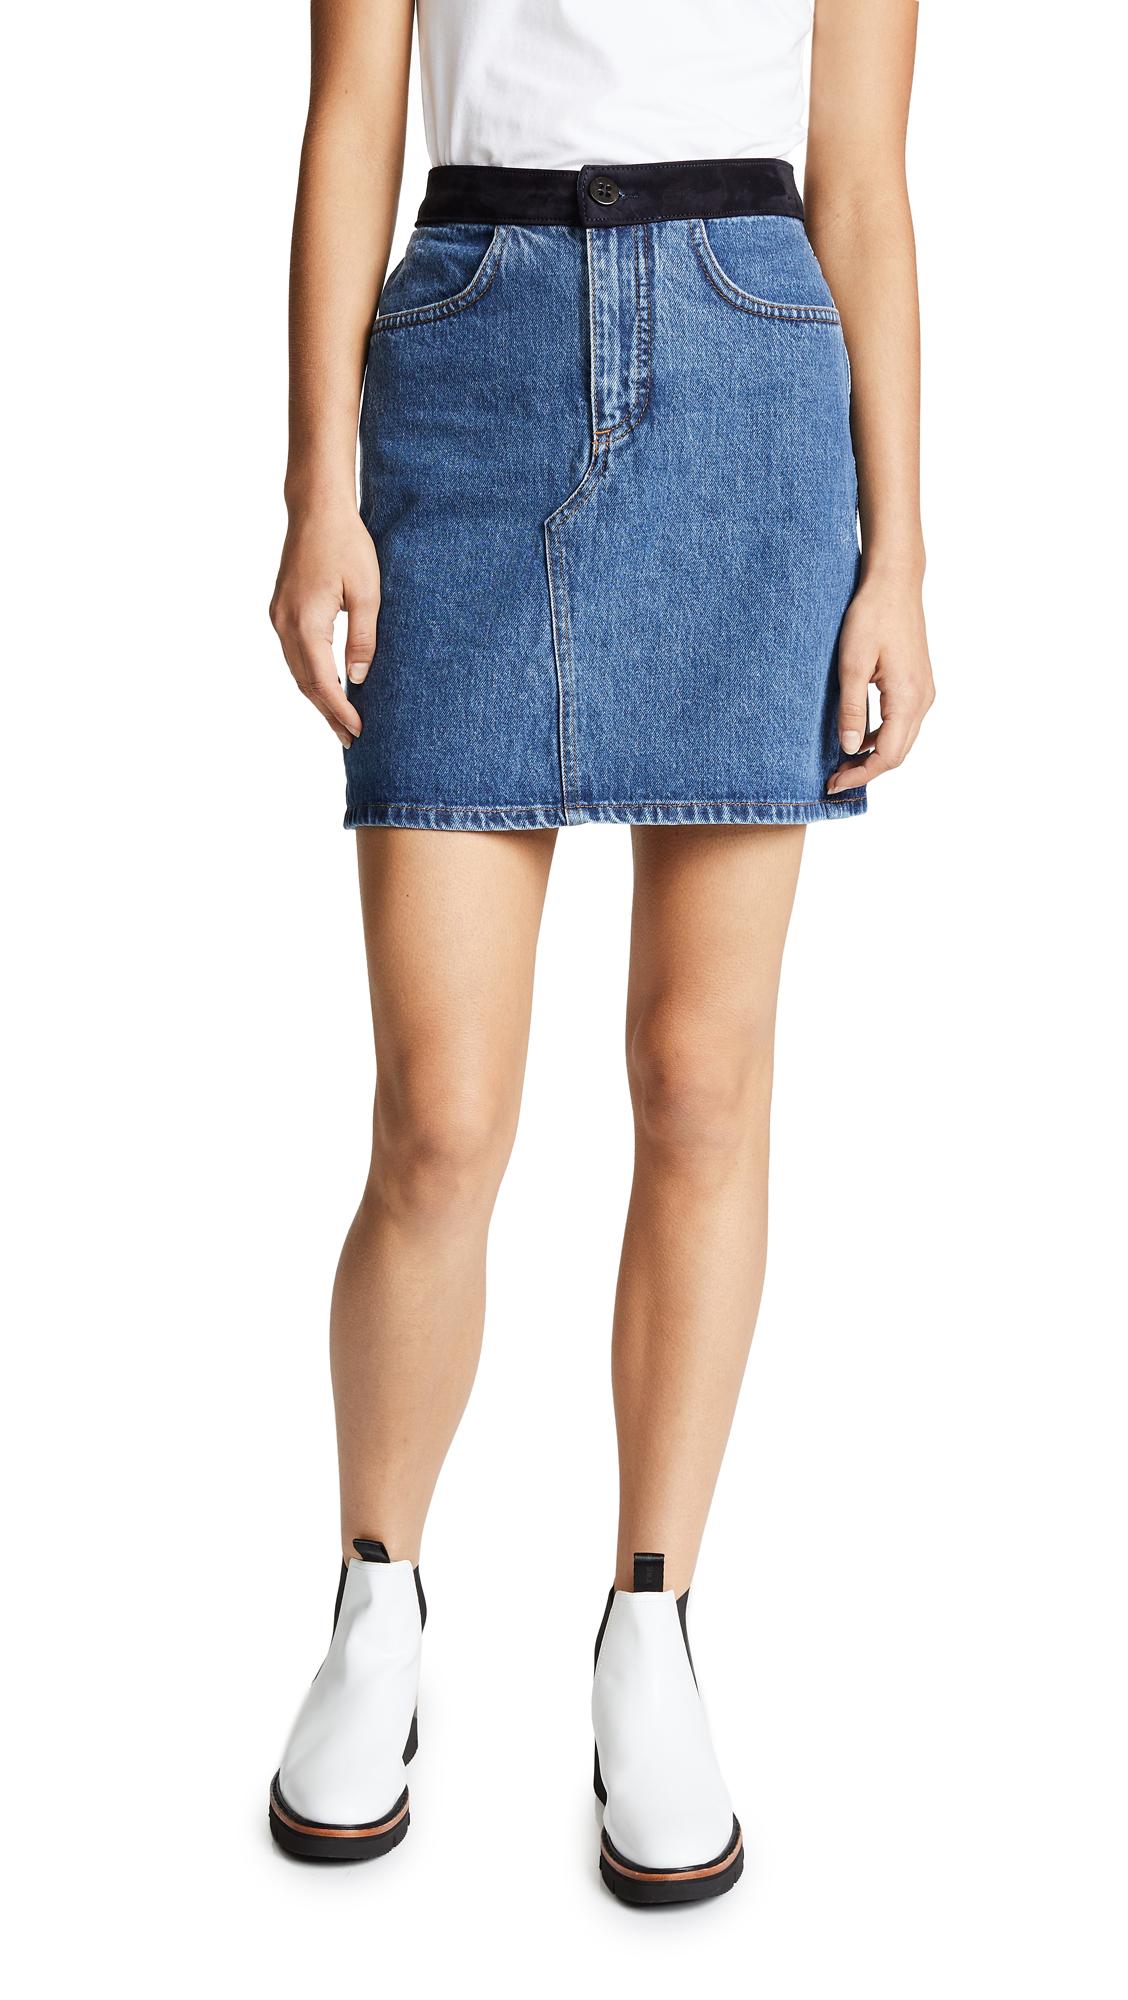 Suede-Trimmed Denim Mini Skirt in Mid Denim